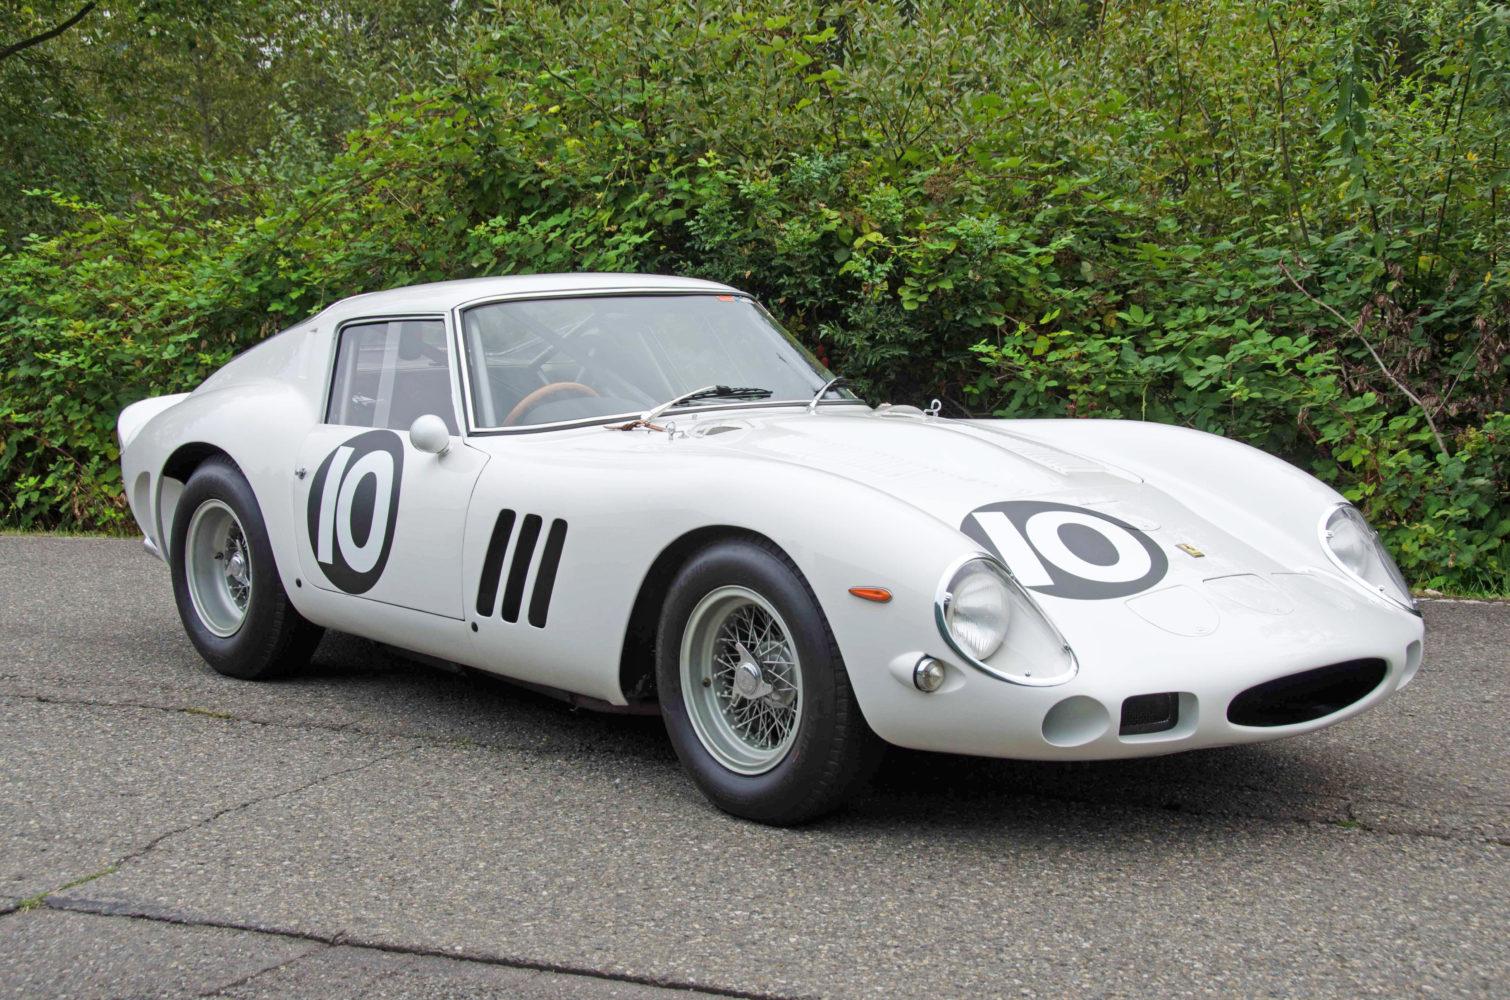 Car of the Week #1: Ferrari 250 GTO